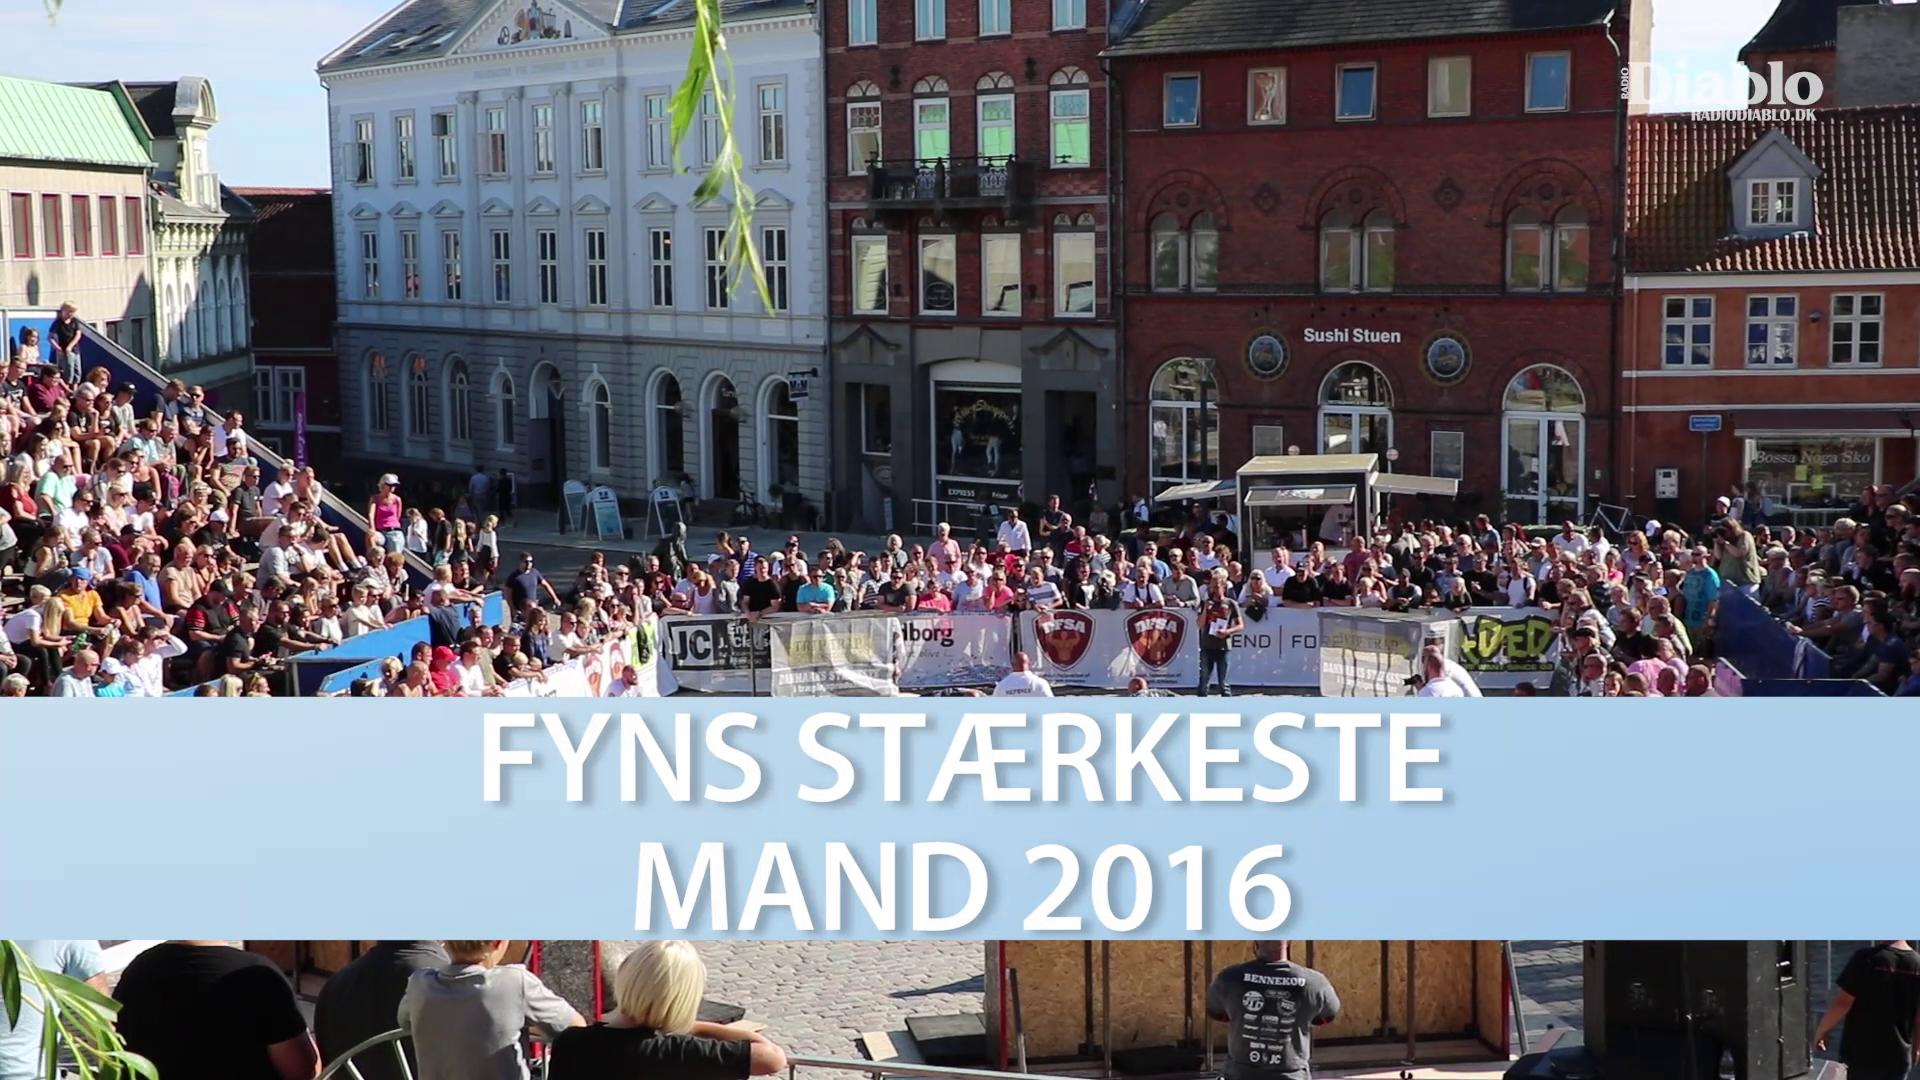 Fyns Starkeste Mand 2016